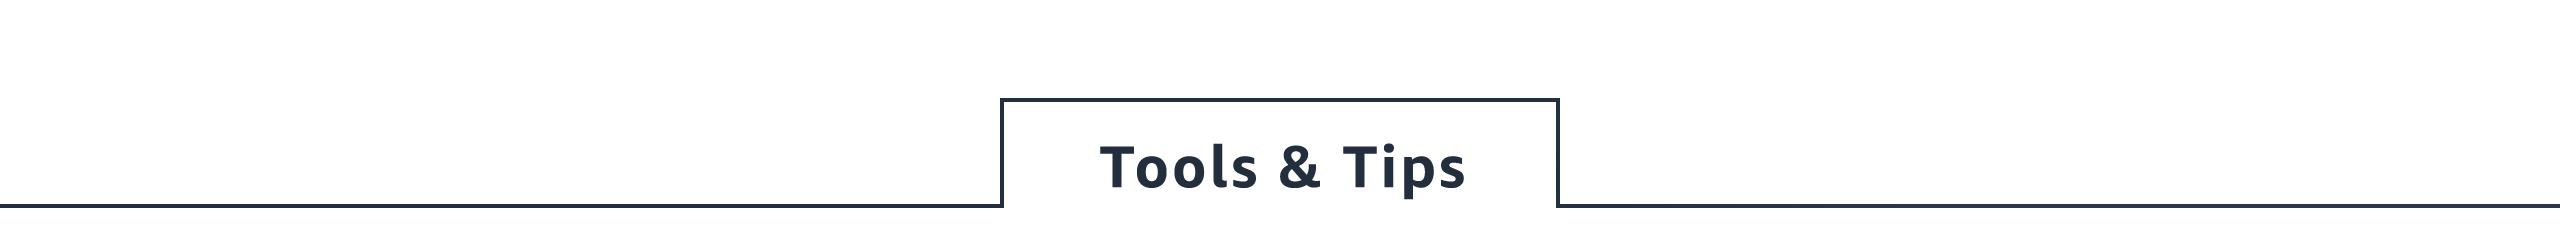 Tools & Tips